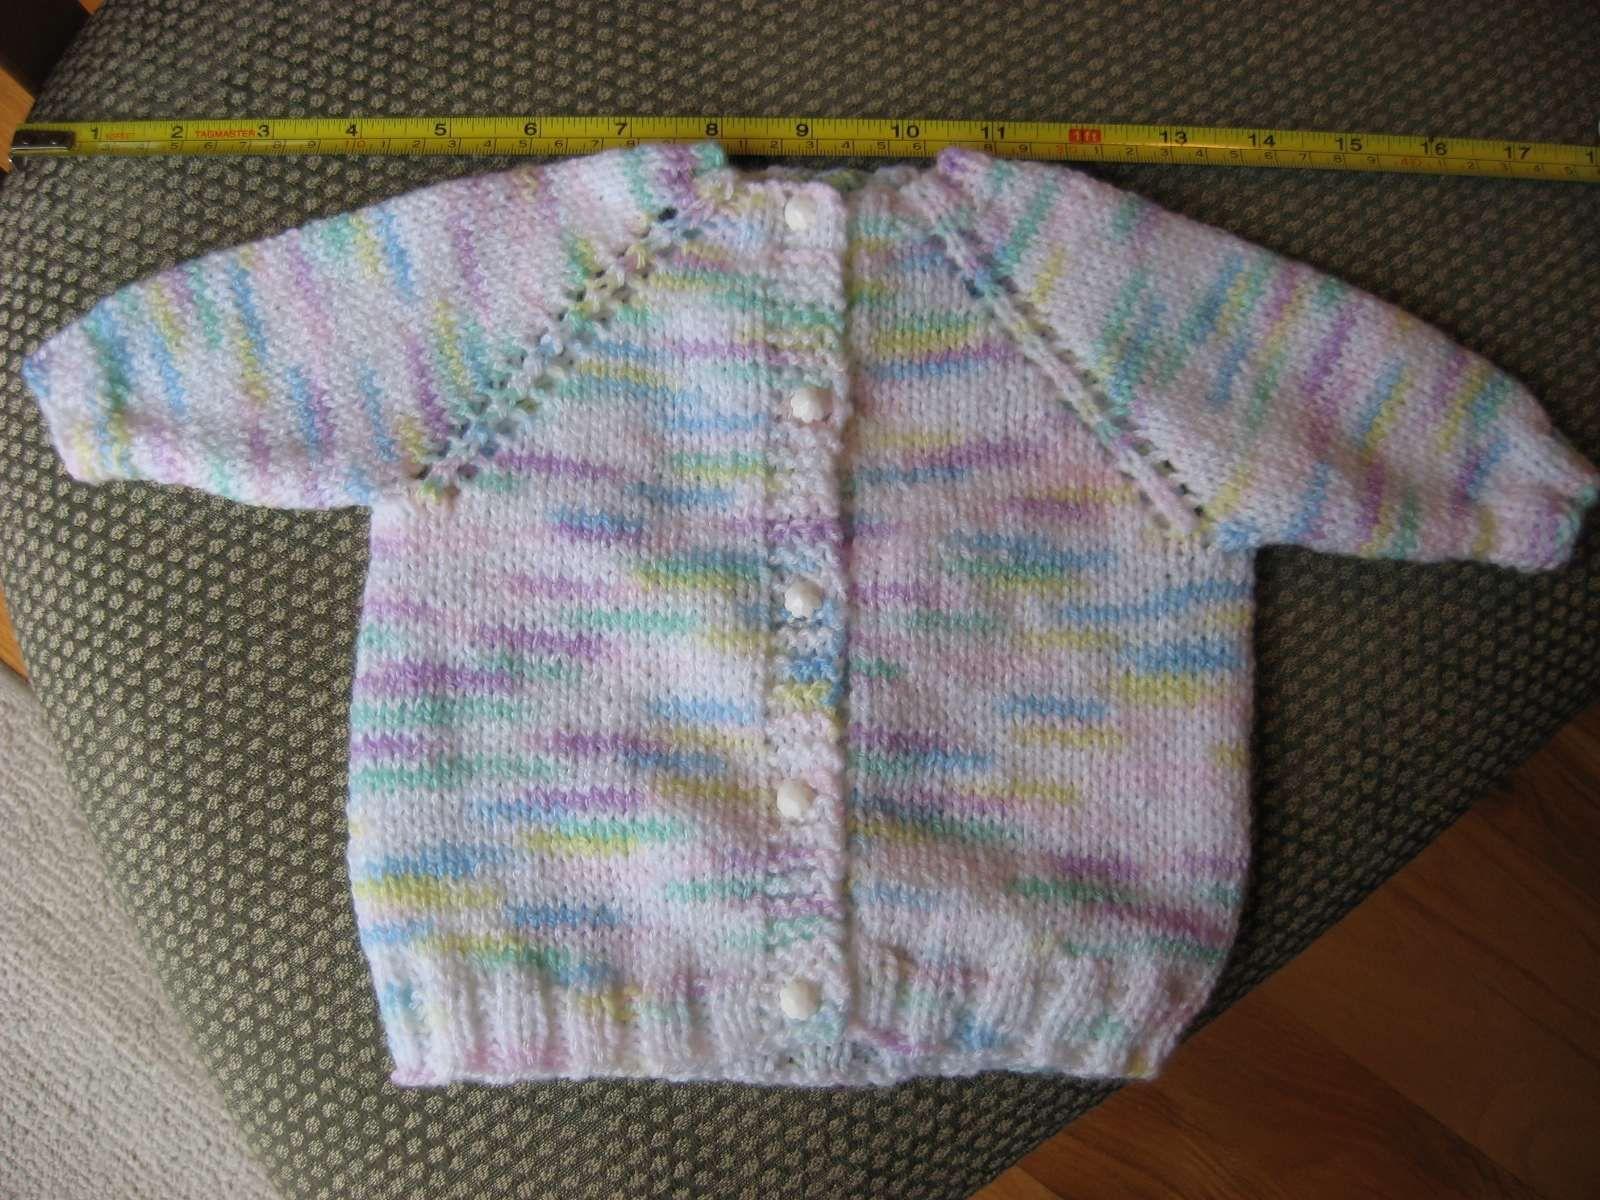 Free newborn knitting patterns google search knitting free newborn knitting patterns google search baby sweater bankloansurffo Gallery